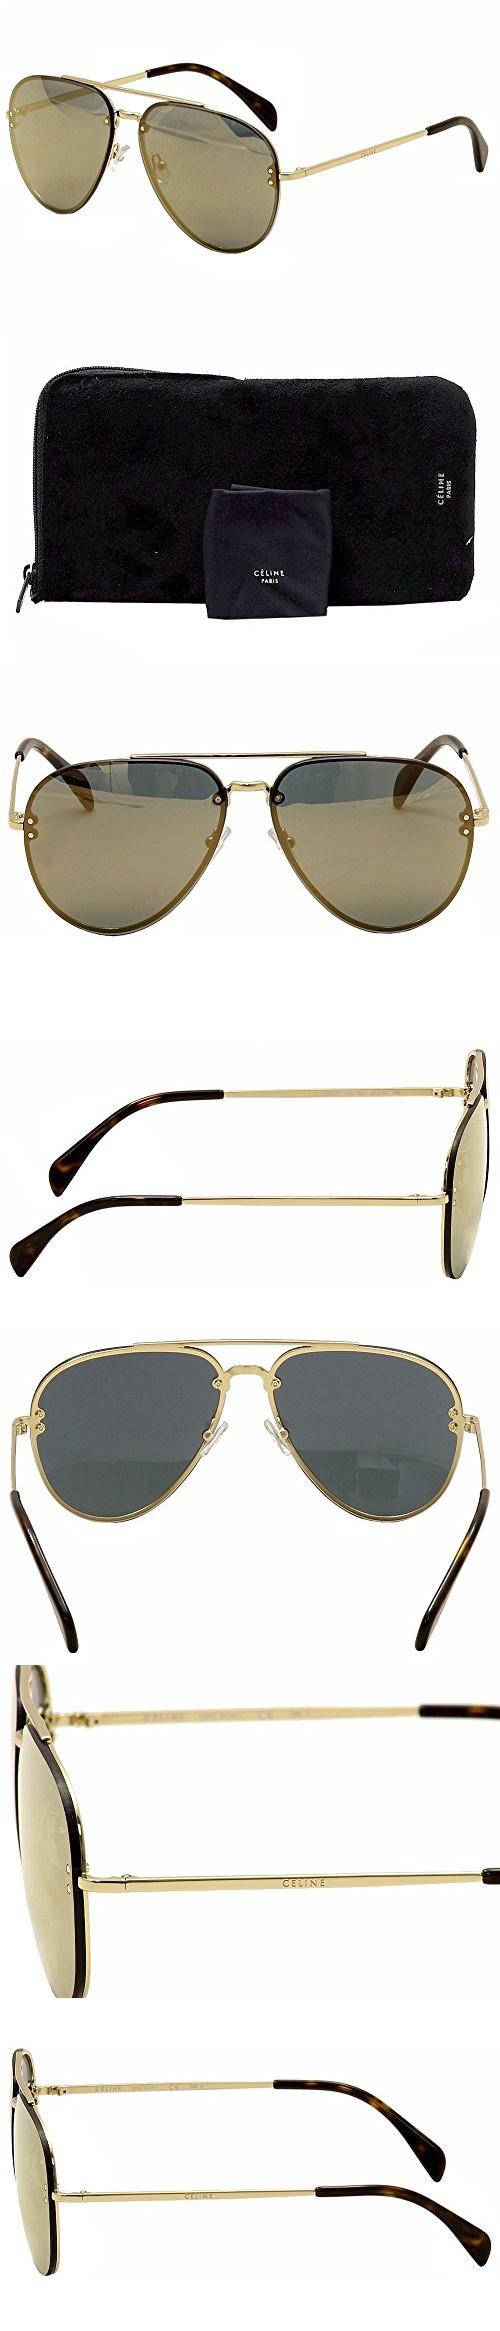 f4be107b897 Celine Mirror CL 41391 J5G MV Gold Metal Aviator Sunglasses ...